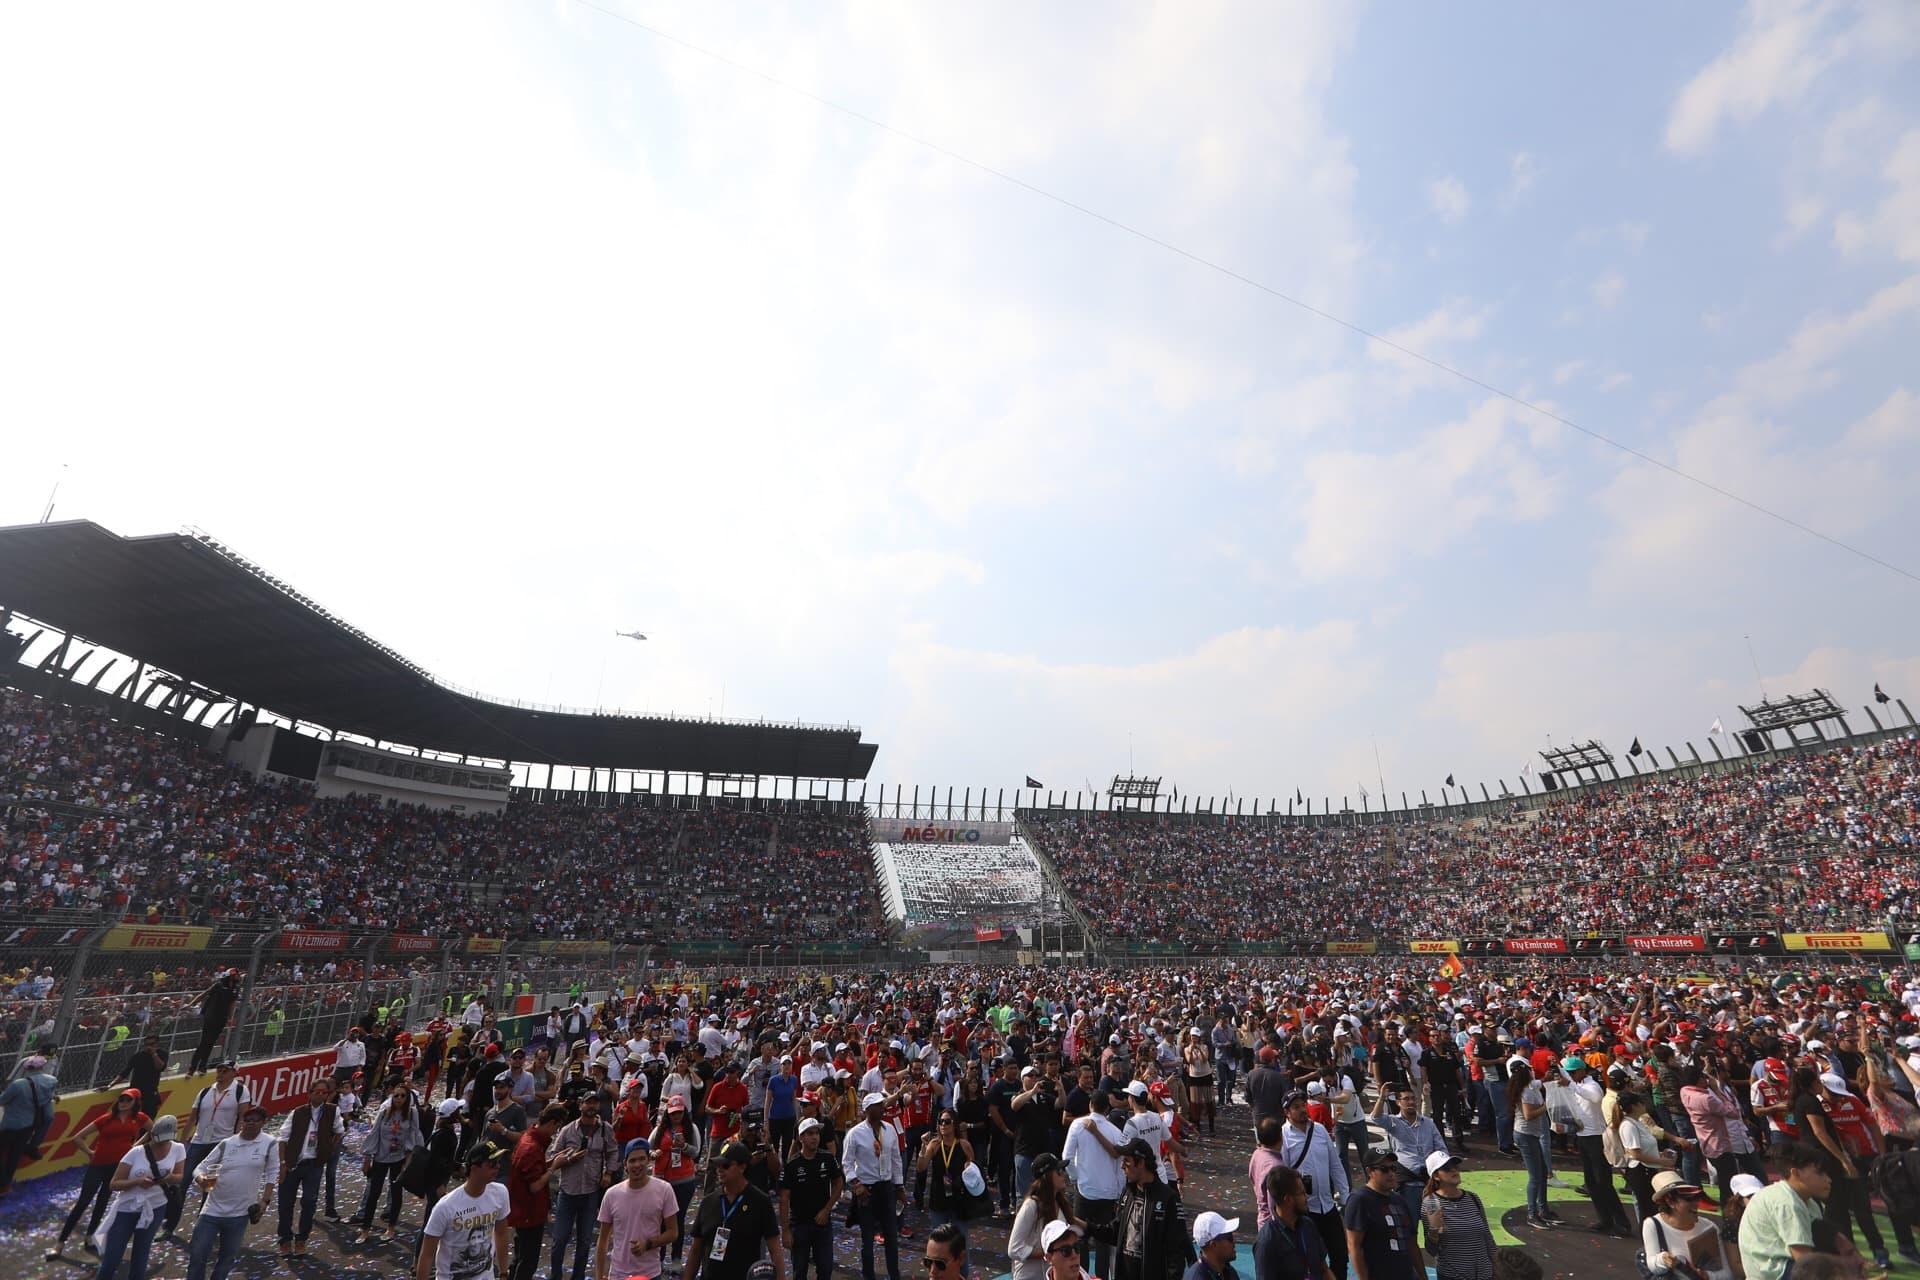 Mexican Grand Prix 2021 – 5-star Hotel Mexico City – Autódromo Hermanos Rodríguez